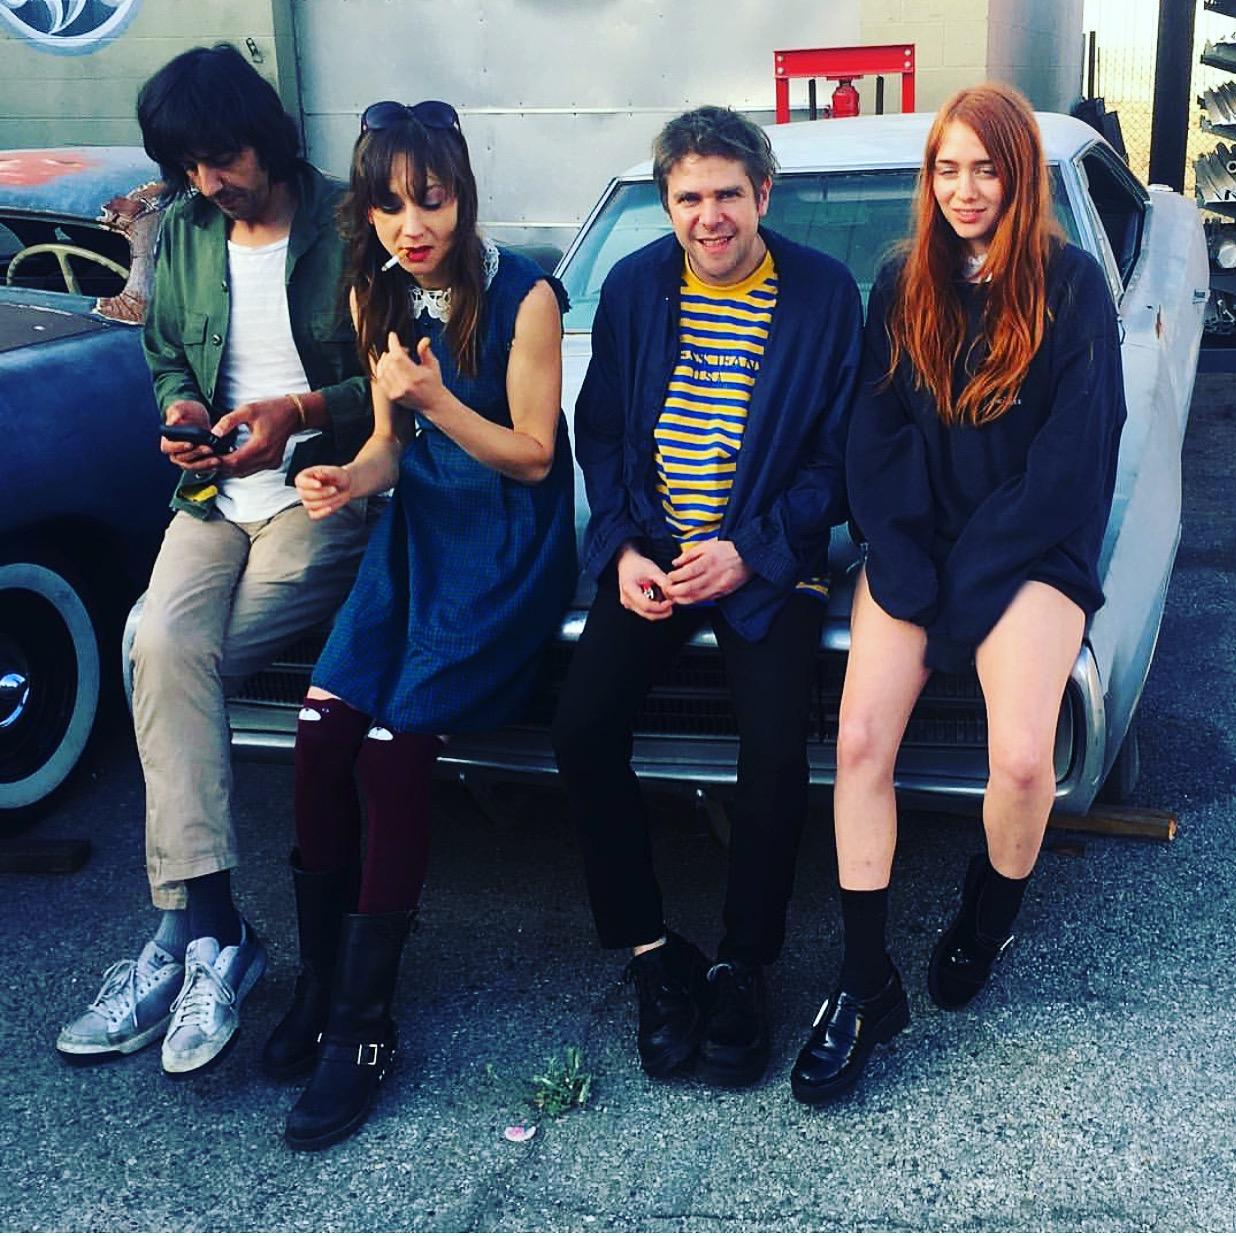 L-R // Aaron Sperske, Annie Hardy, Ariel Pink and Charlotte Ercoli. Photo by Joe Cardamone.